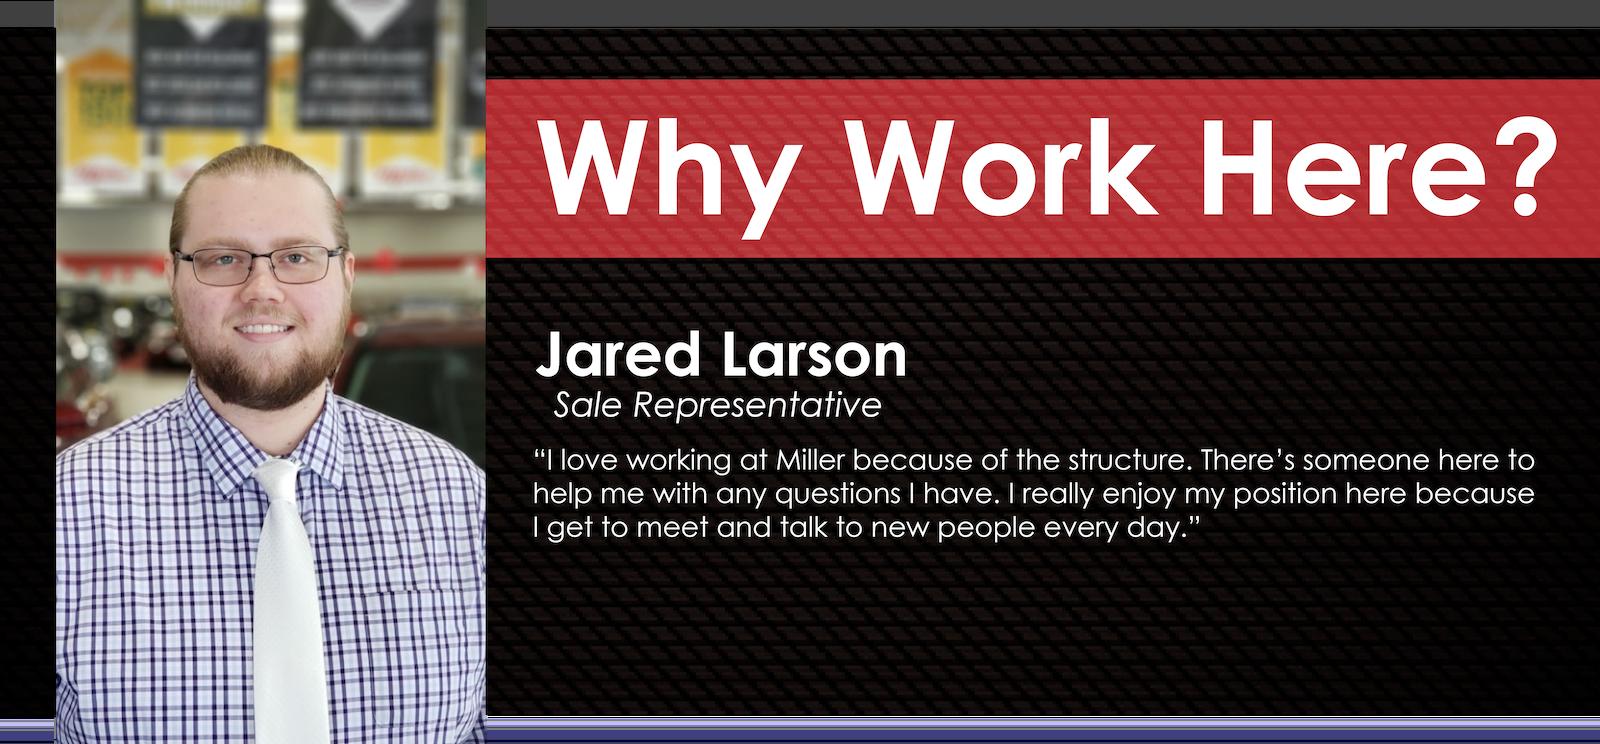 Jared Larson